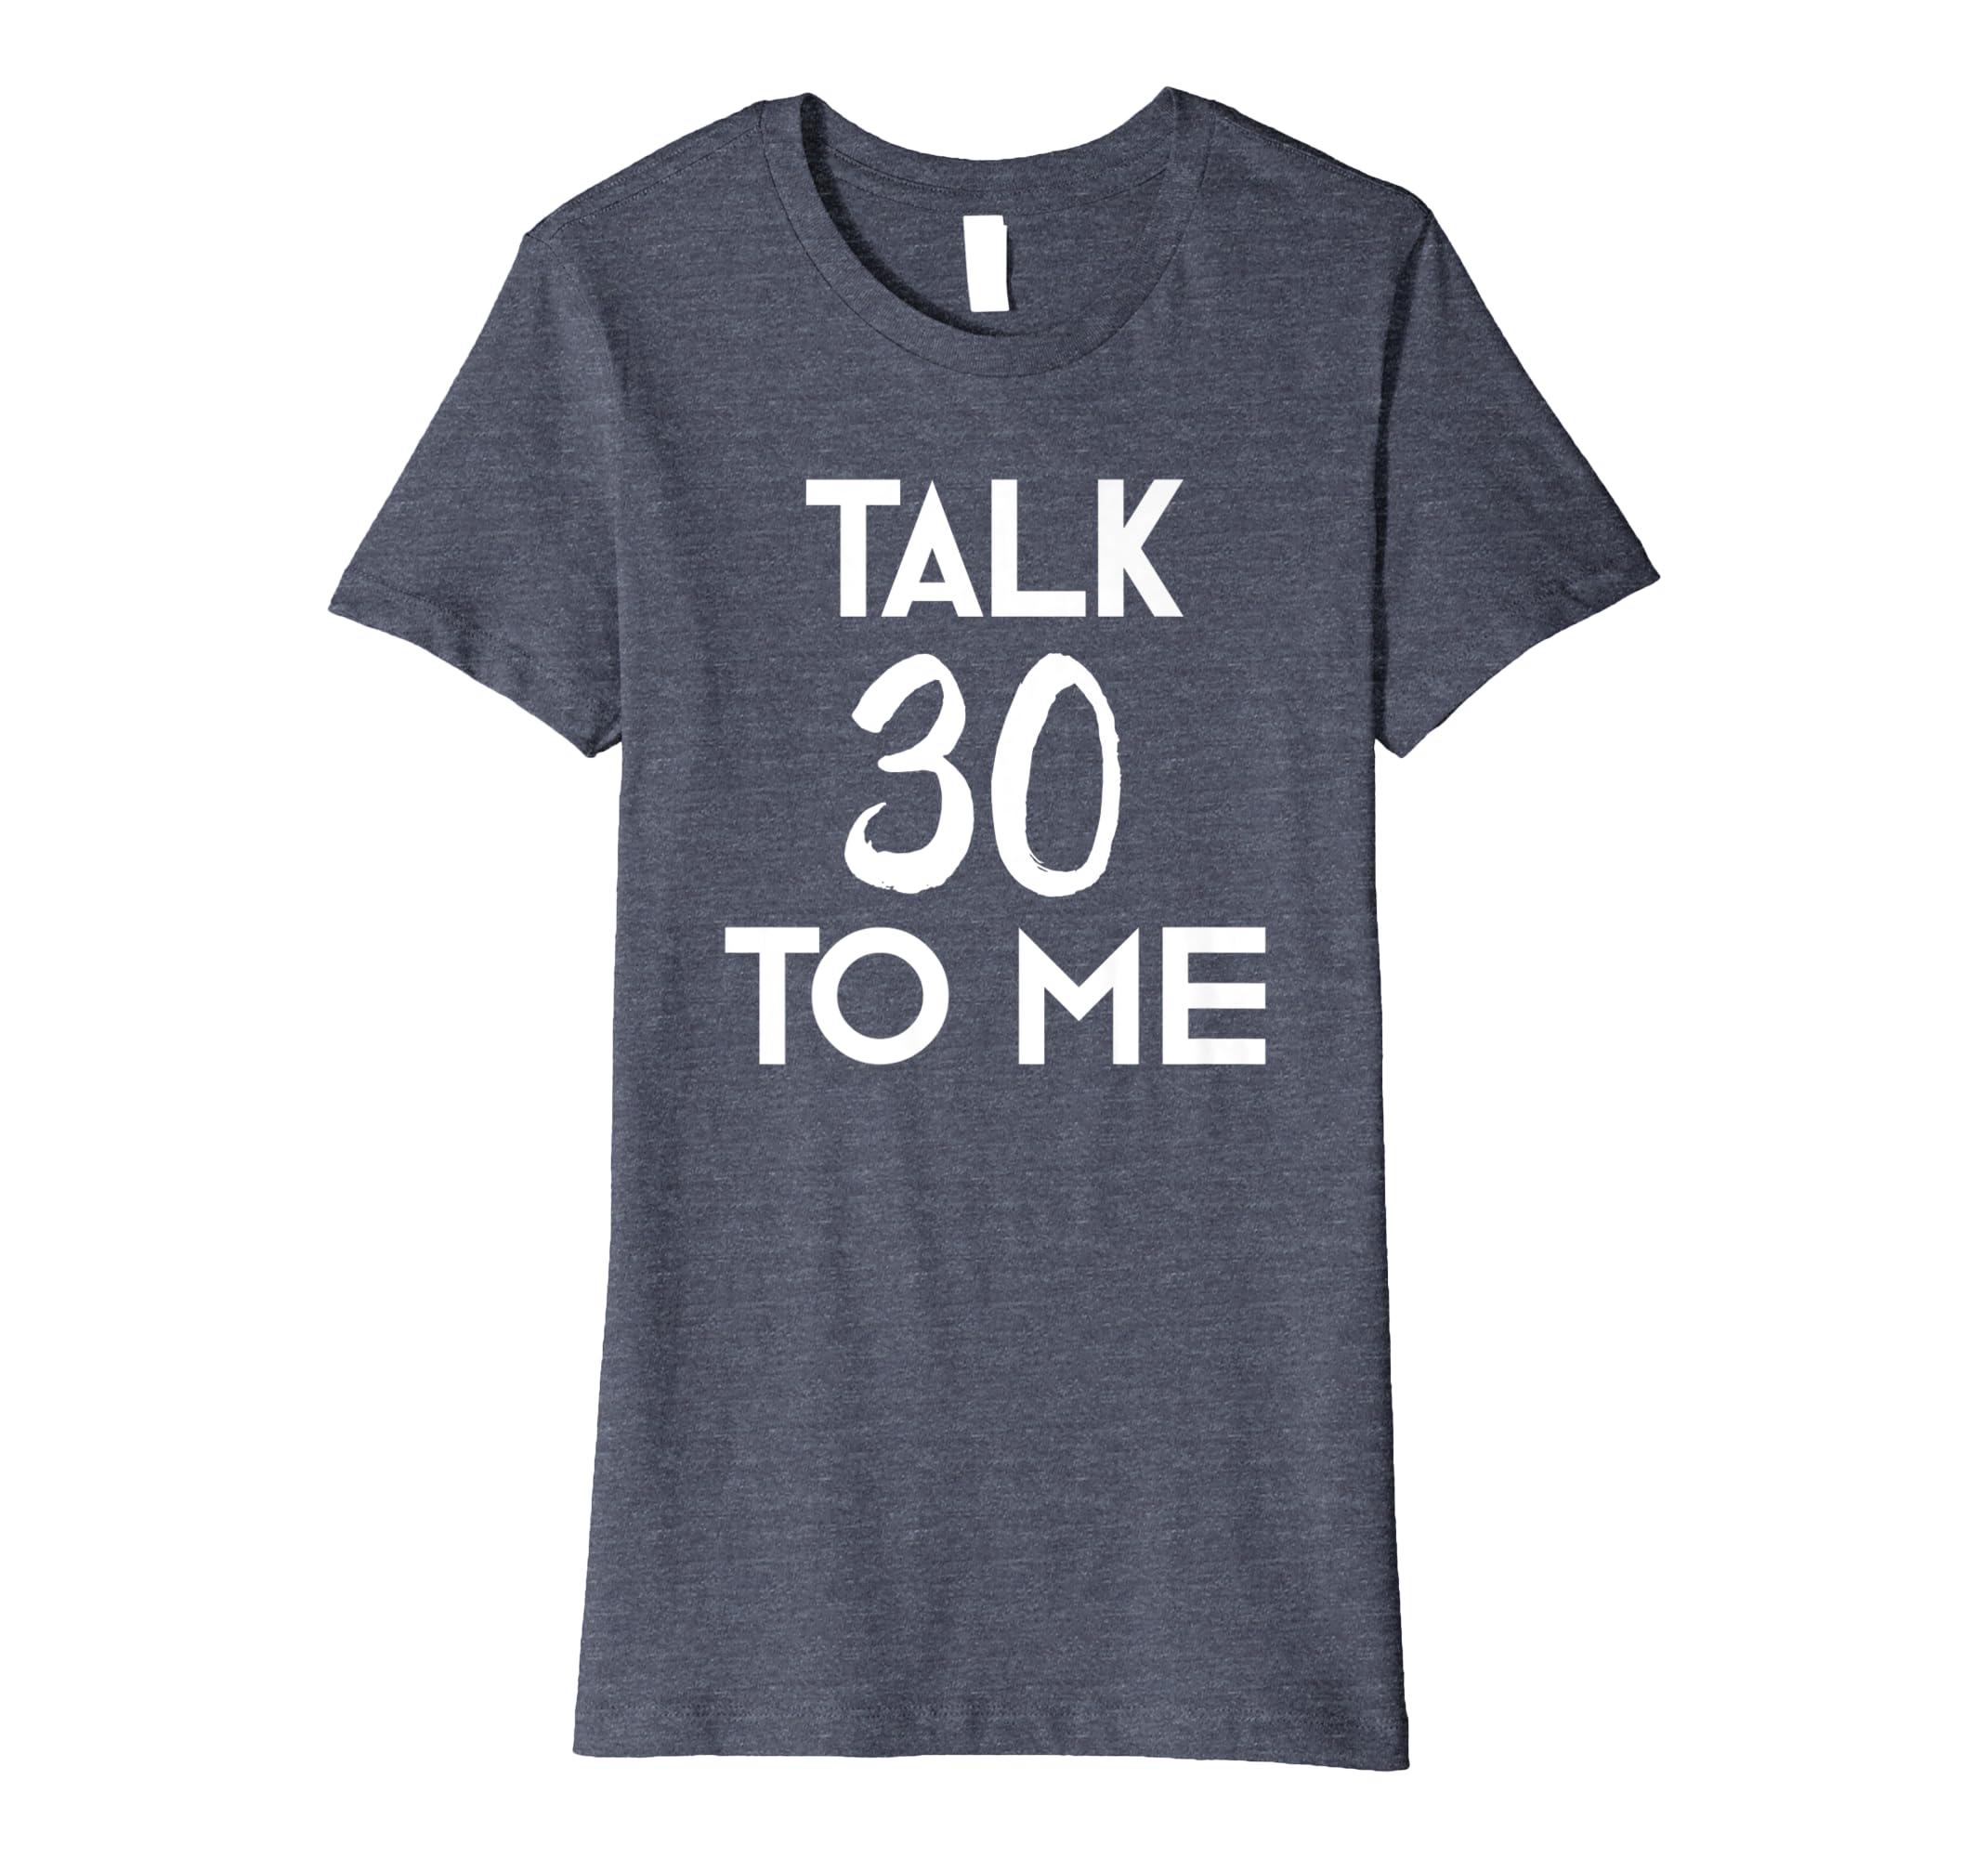 7bdf0bfbe Amazon 30th Birthday Gift T Shirt Funny Talk 30 To Me Tee Him Her Clothing